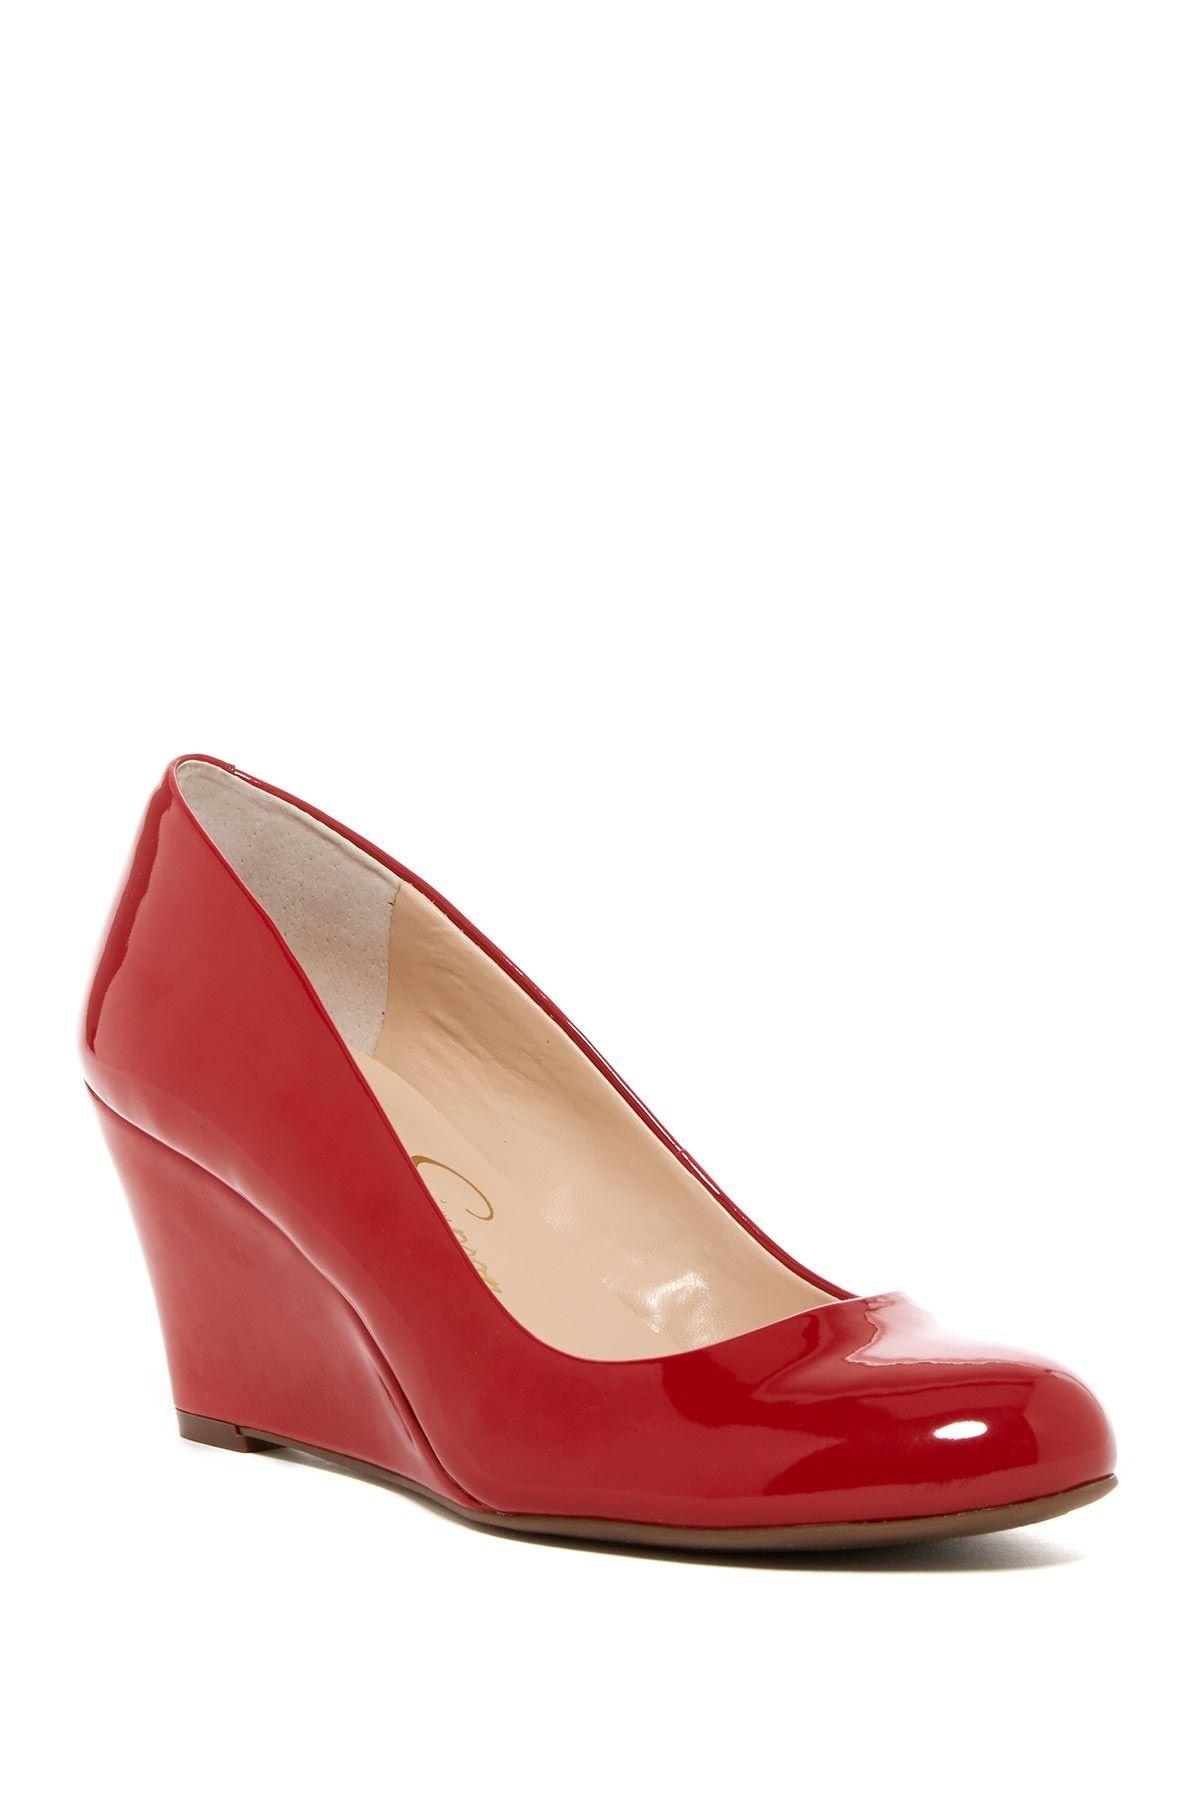 Womens wide width shoes